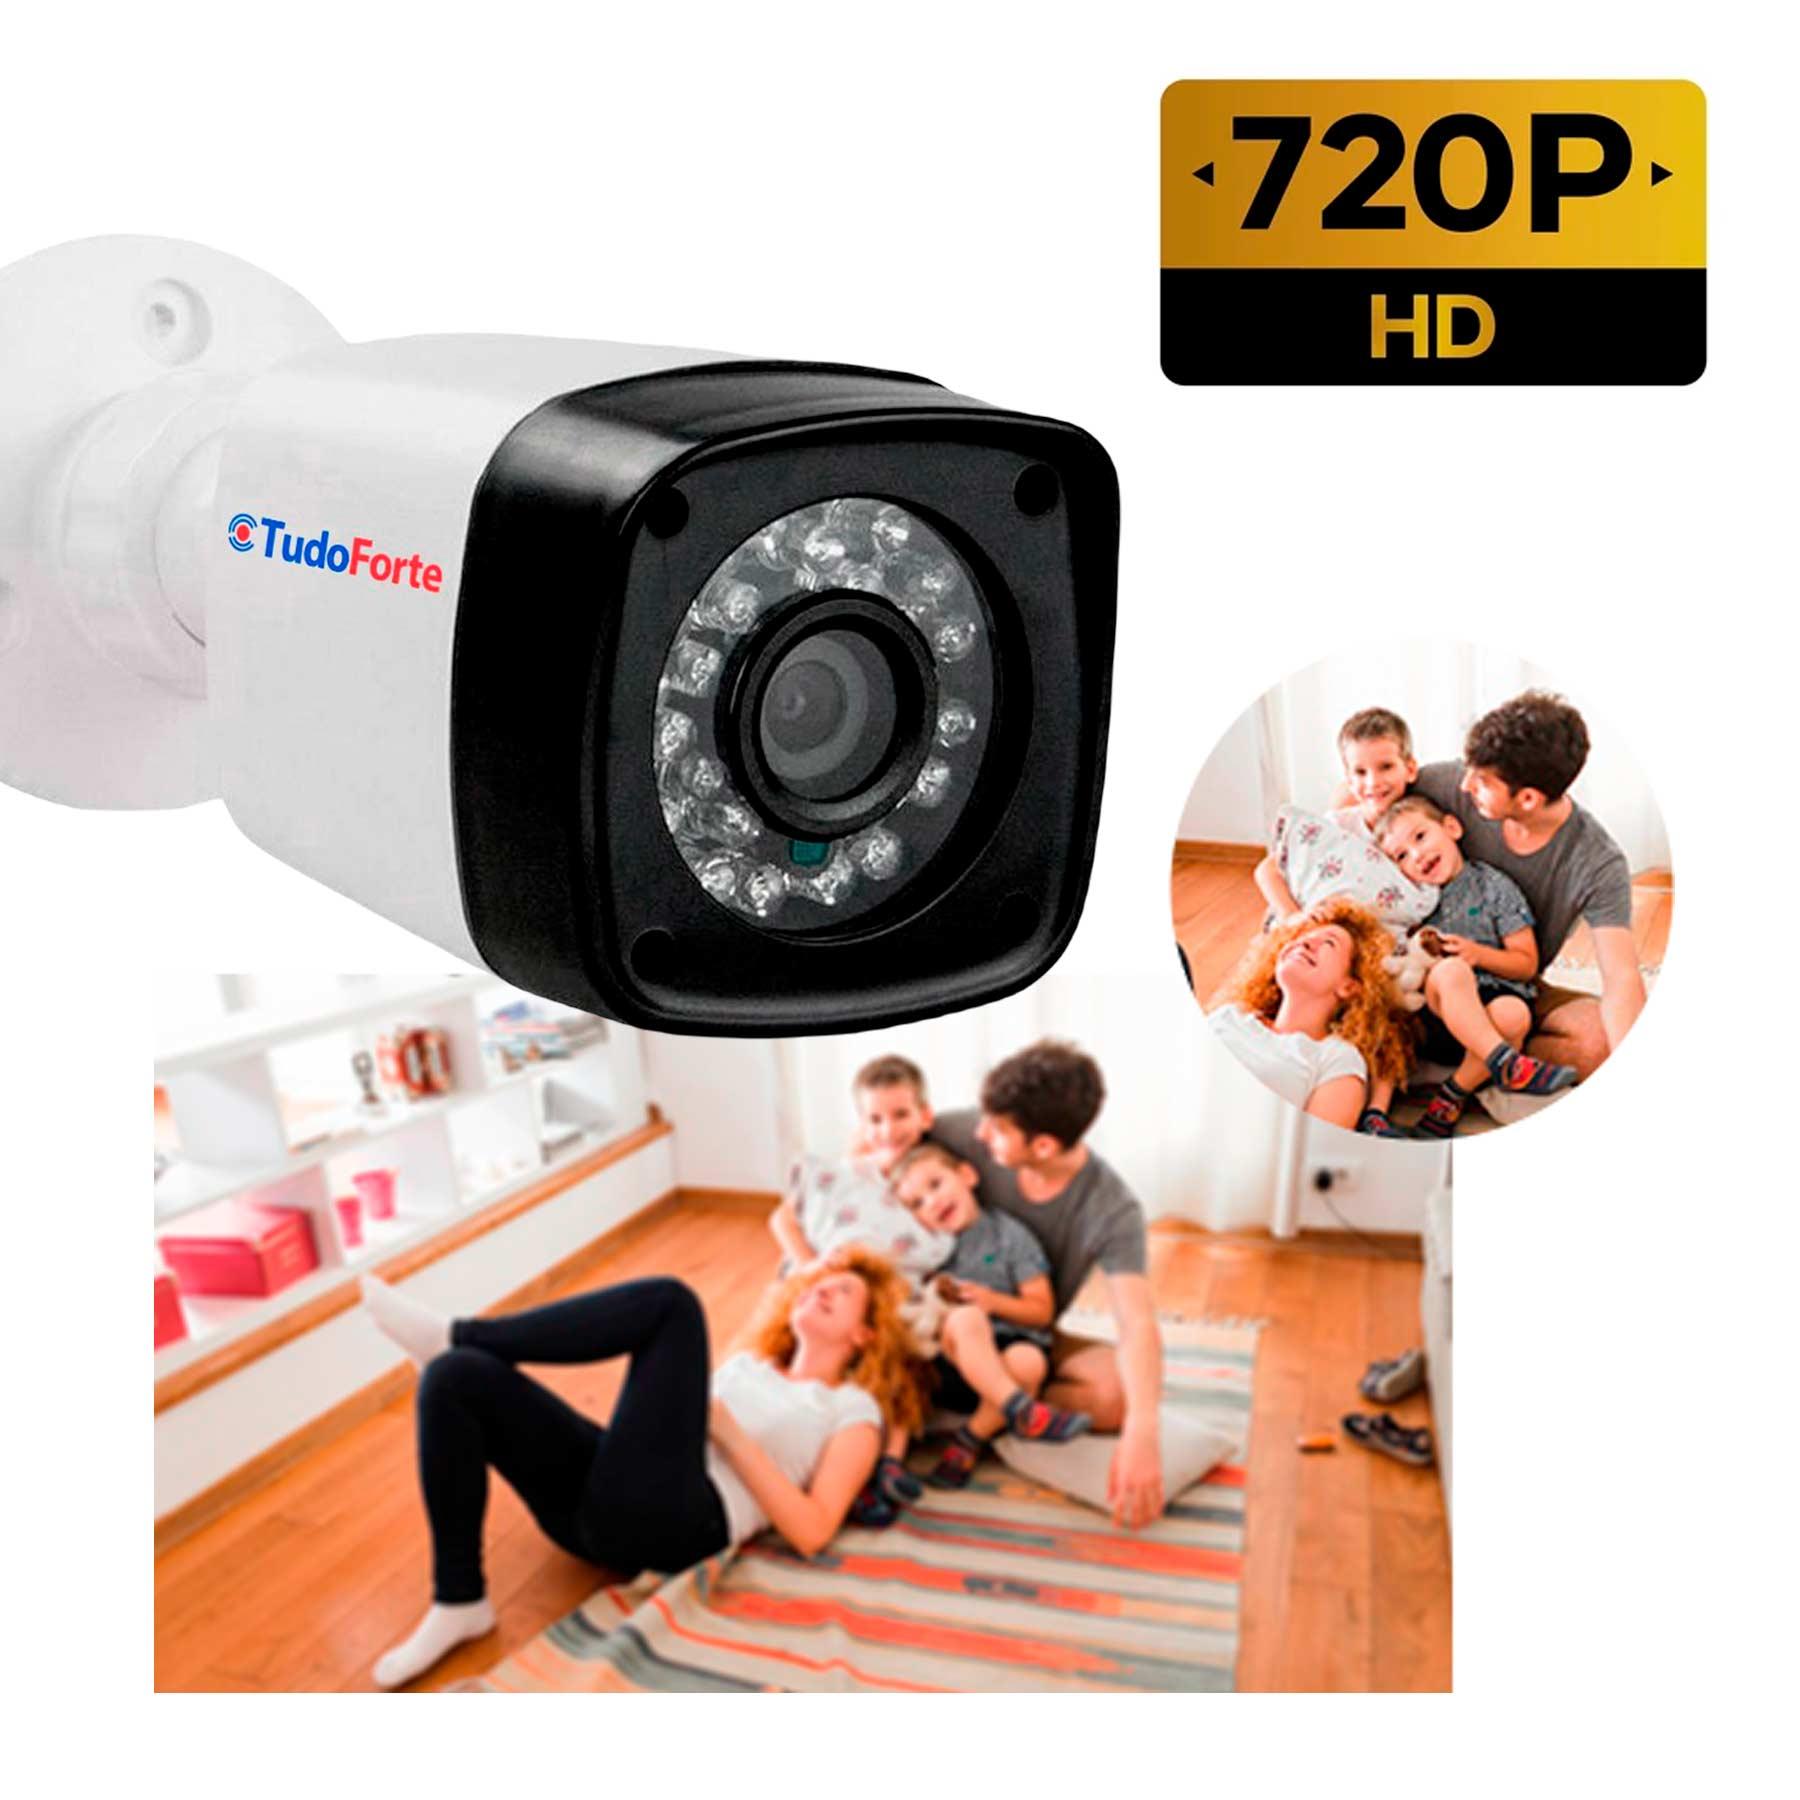 camera-de-seguranca-full-hd-1080p-2mp-bullet-20-metros-infravermelho-tudo-forte-01